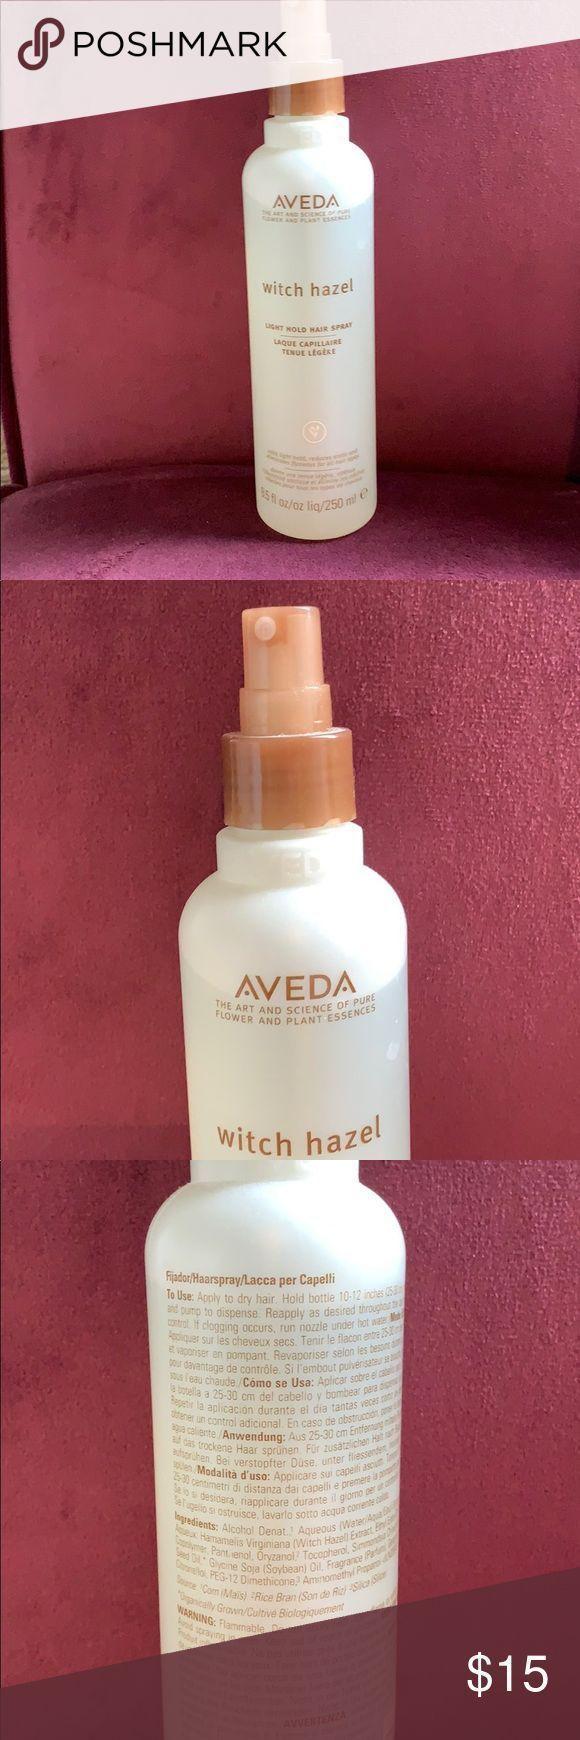 Aveda Hamamelis Haarspray Aveda Haarspray mit leichtem Halt